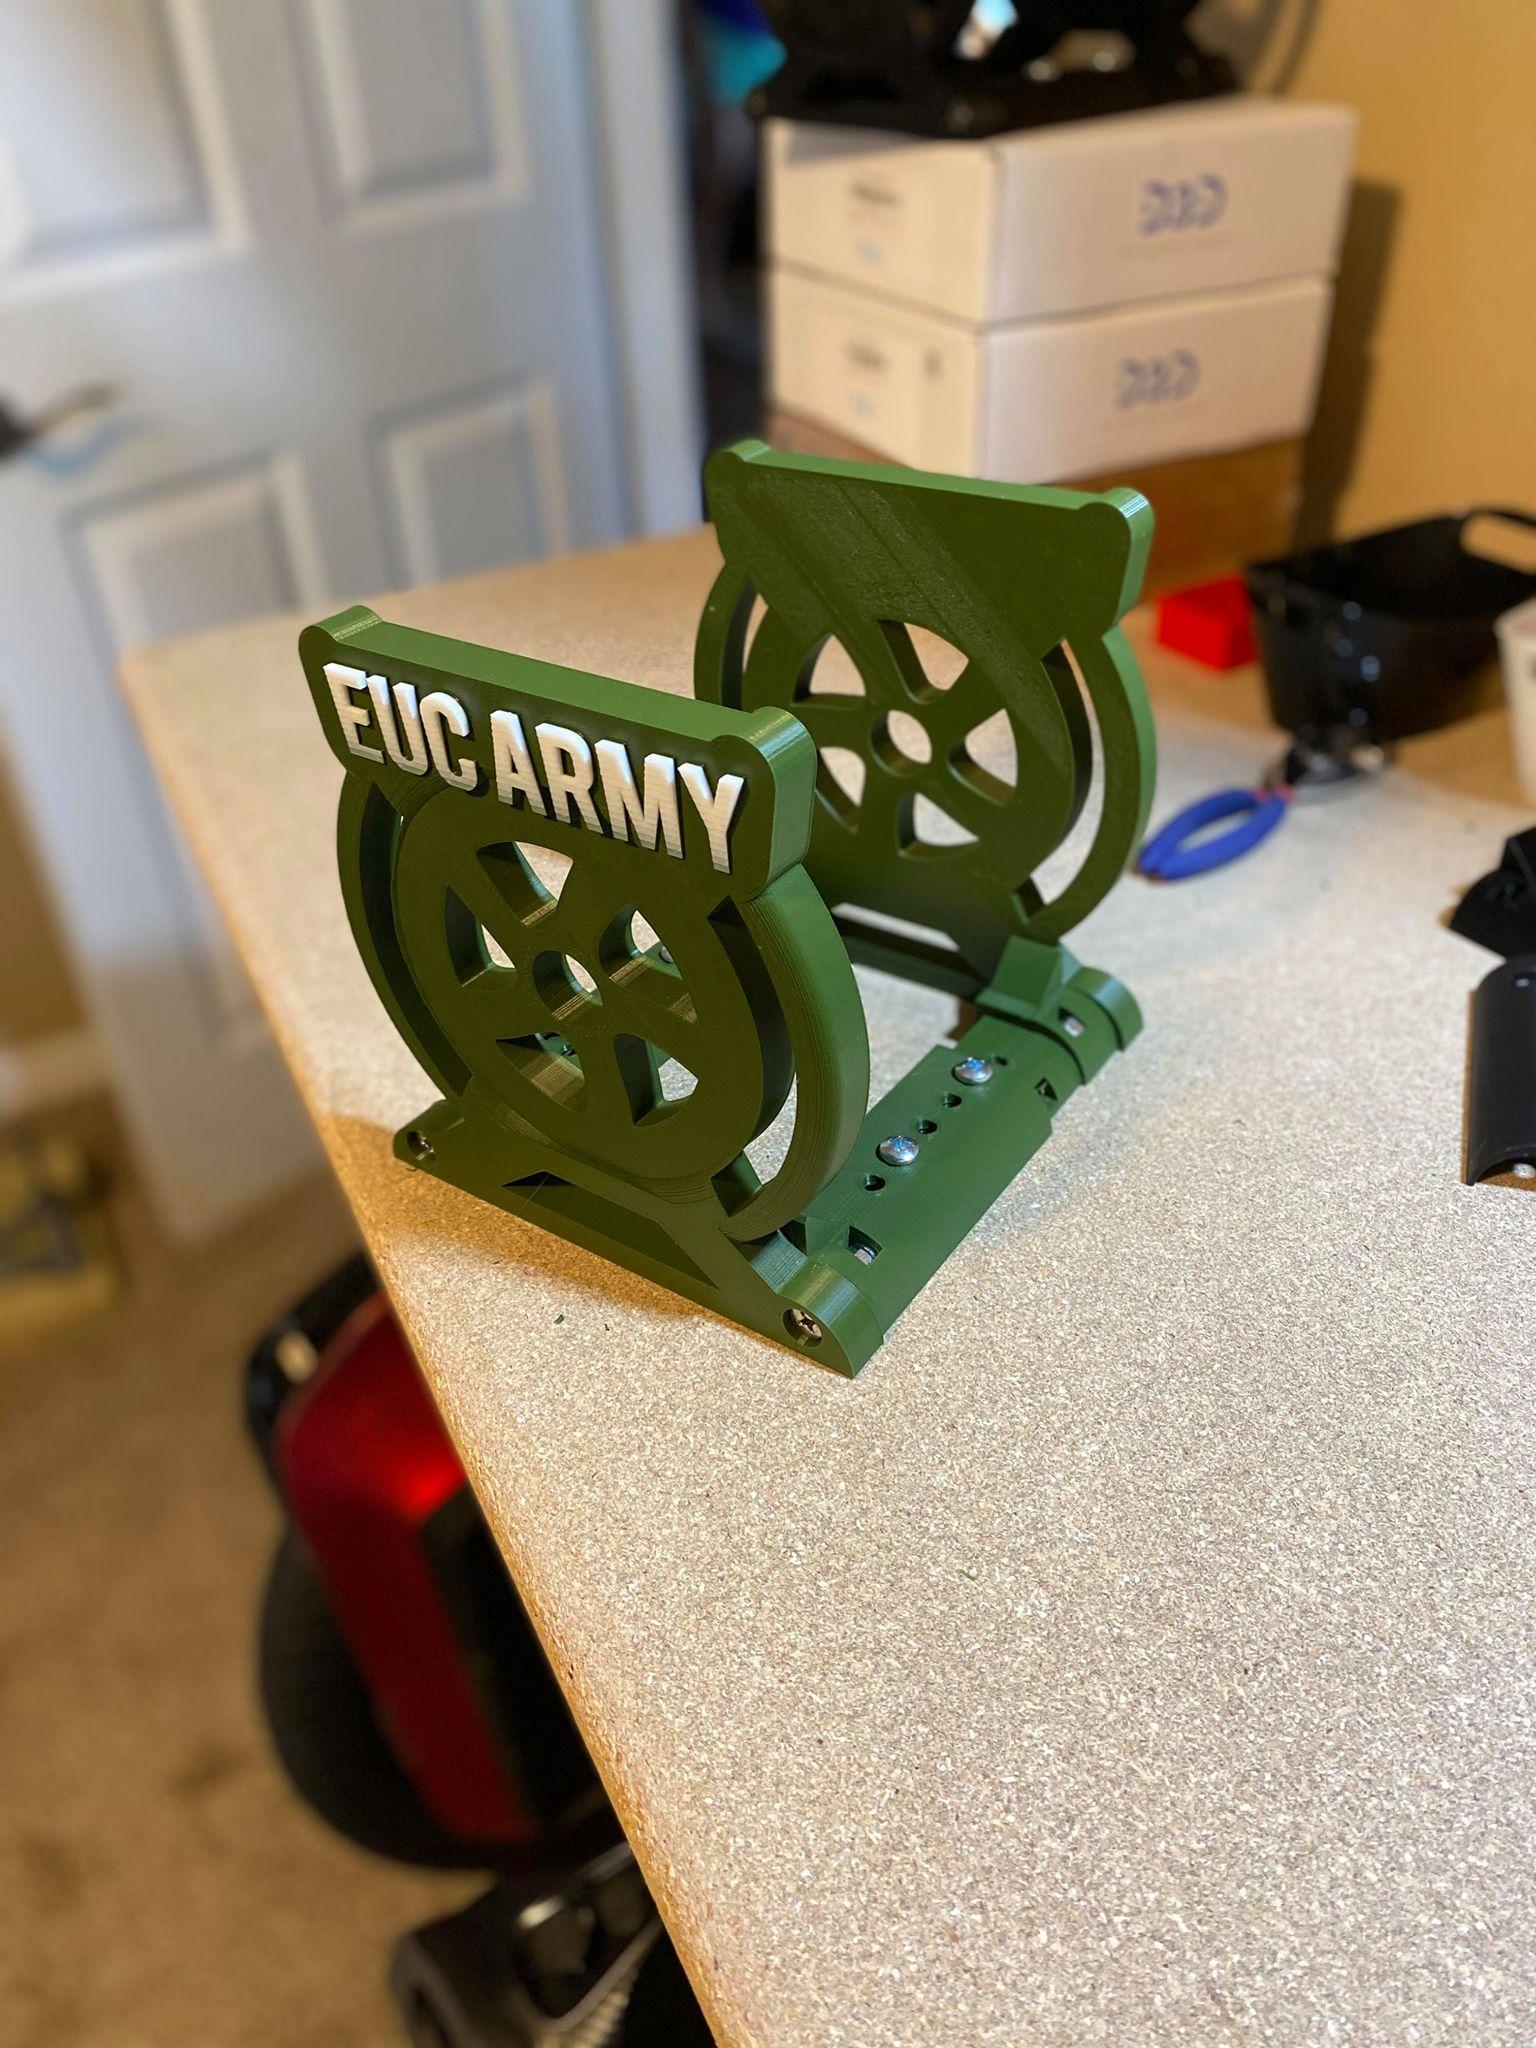 EUC Stand 3.9 Army Green Premiun Adjustable